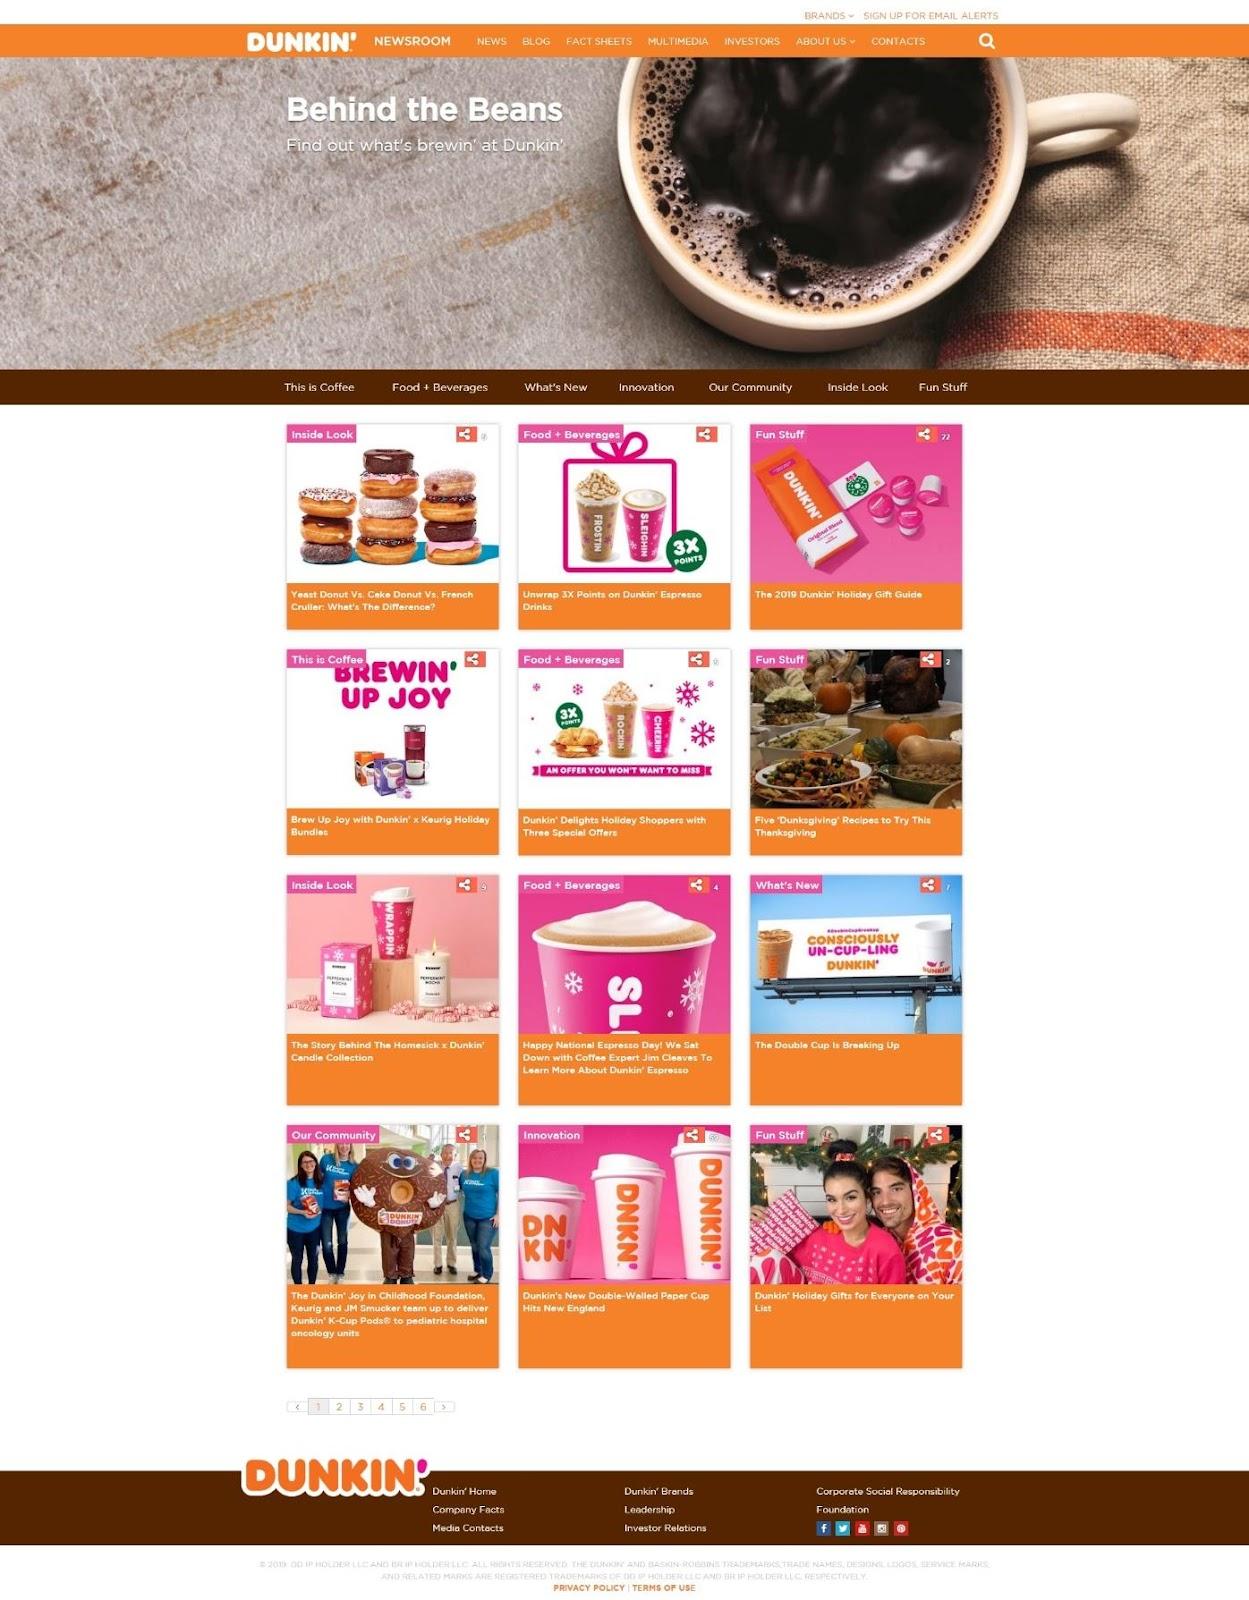 Dunkin Donut's website